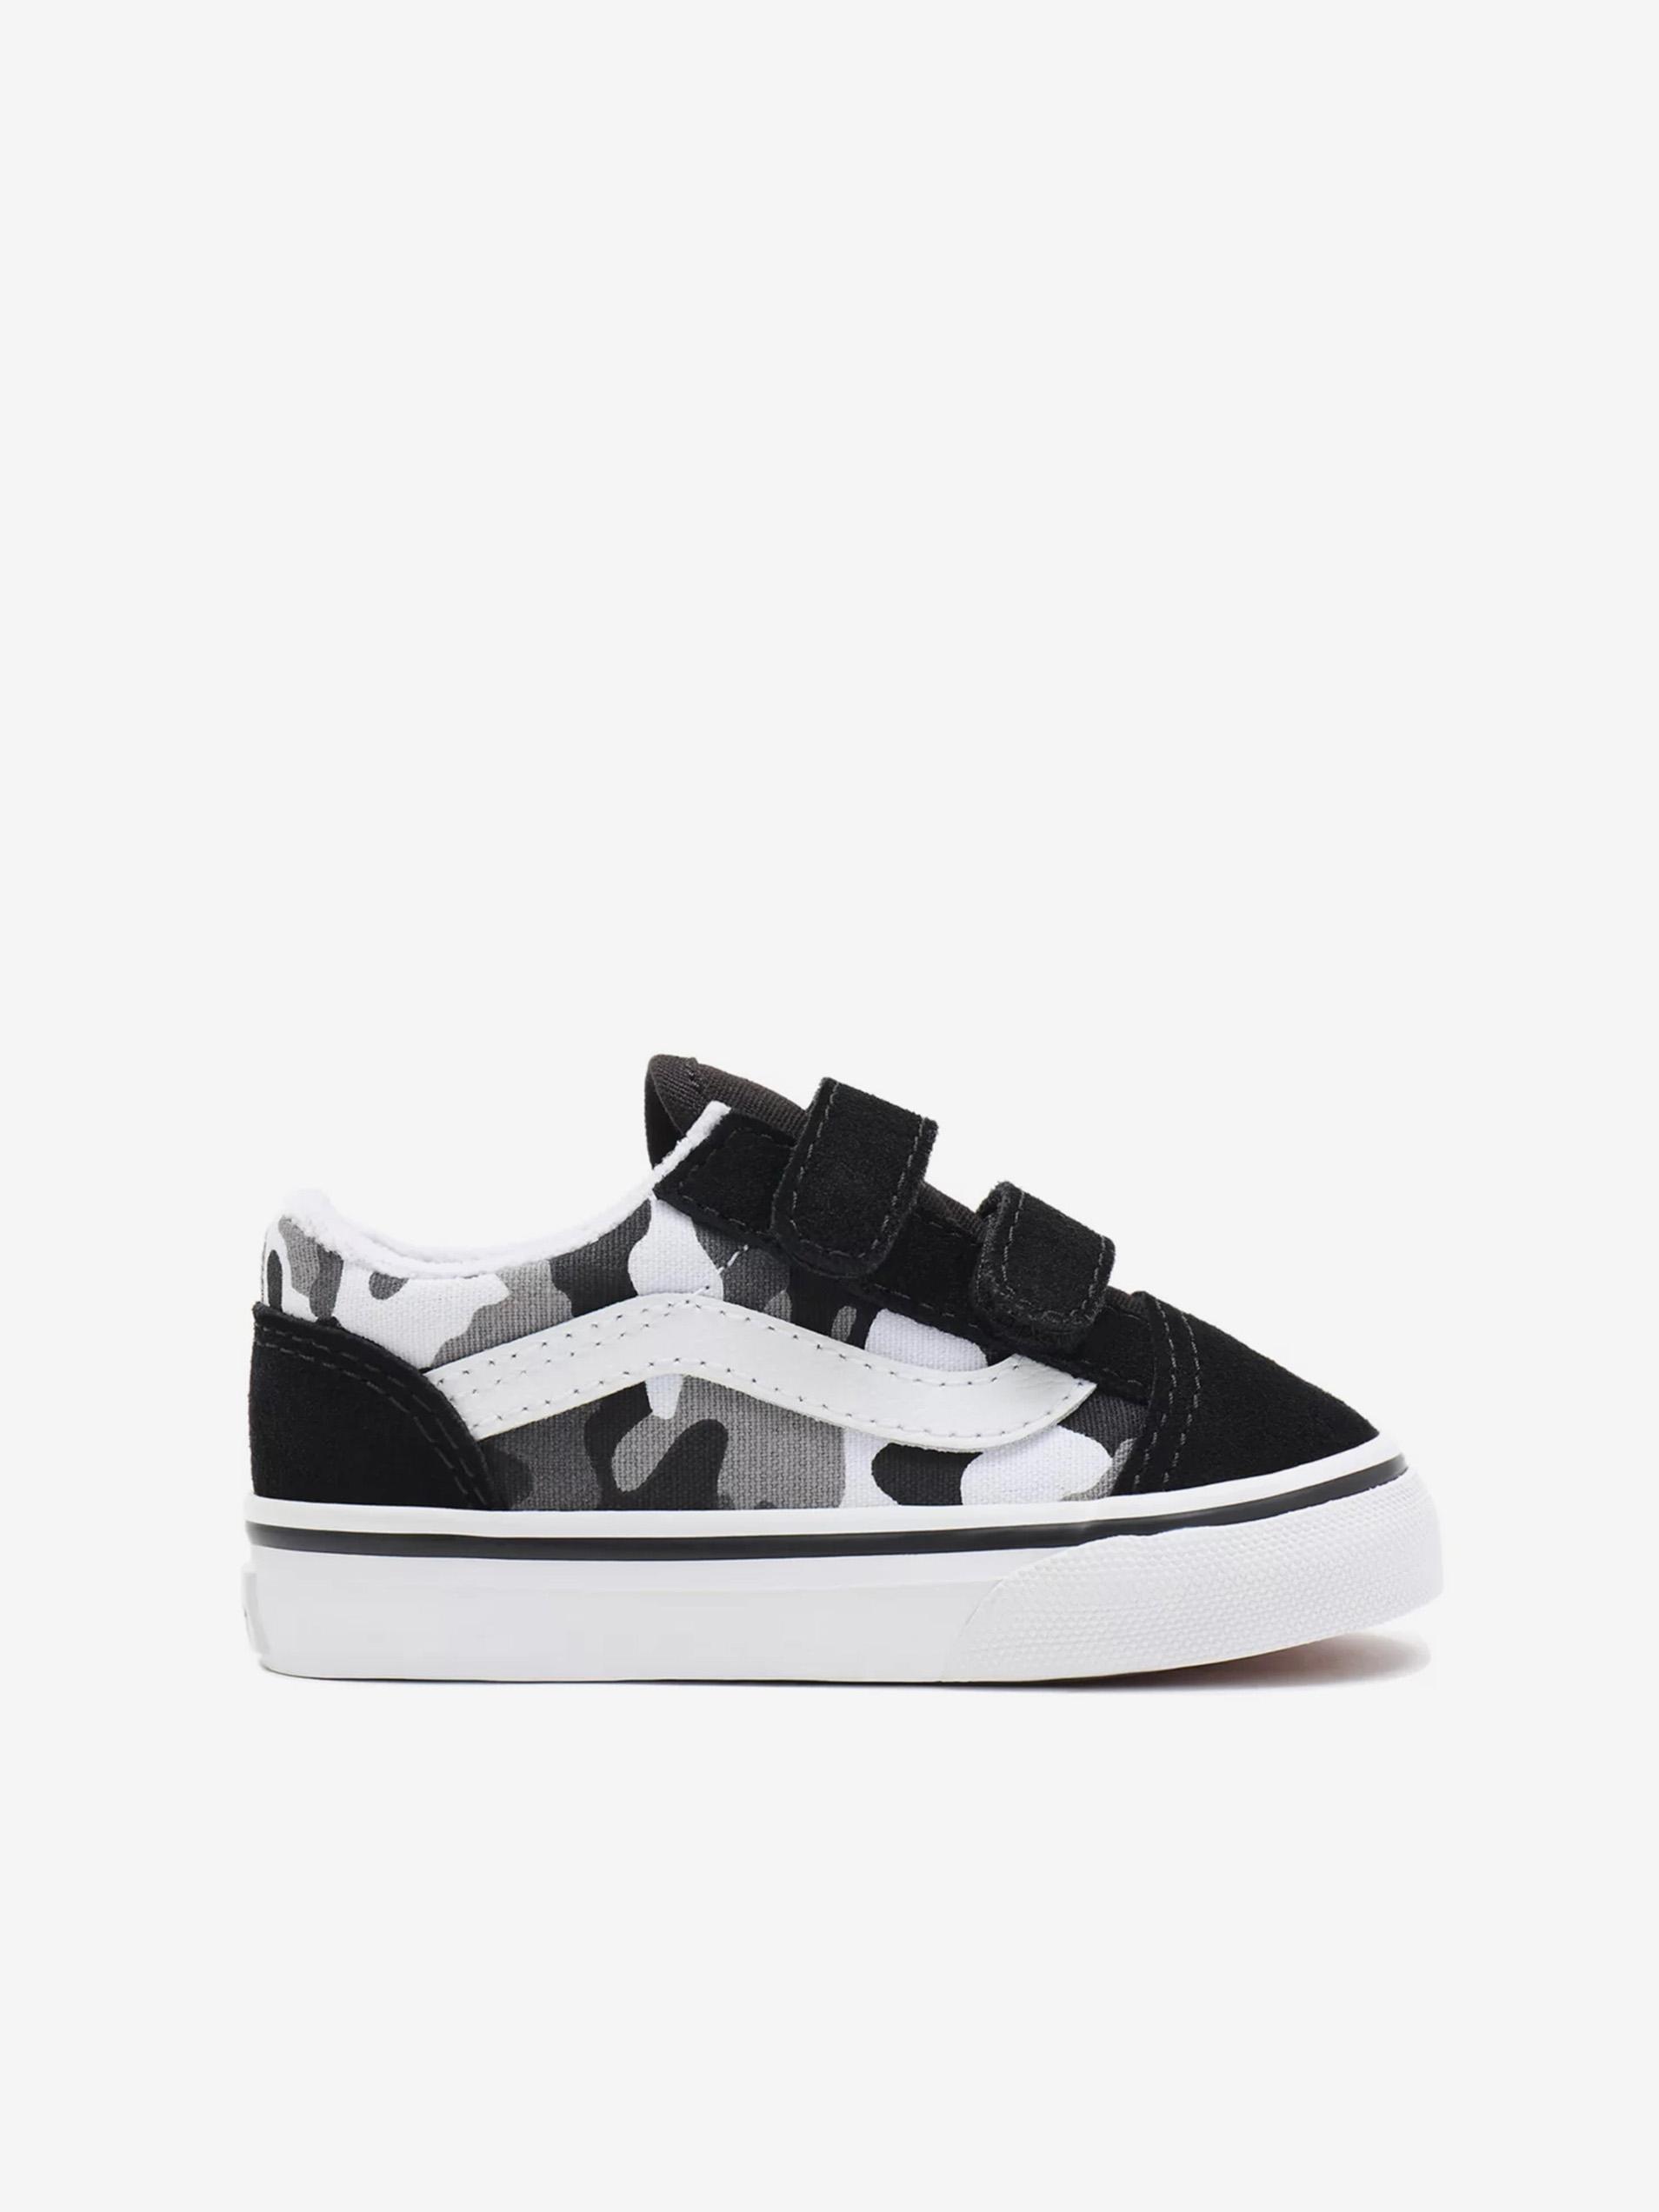 Bielo-čierne chlapčenské semišové topánky VANS Old Skool -